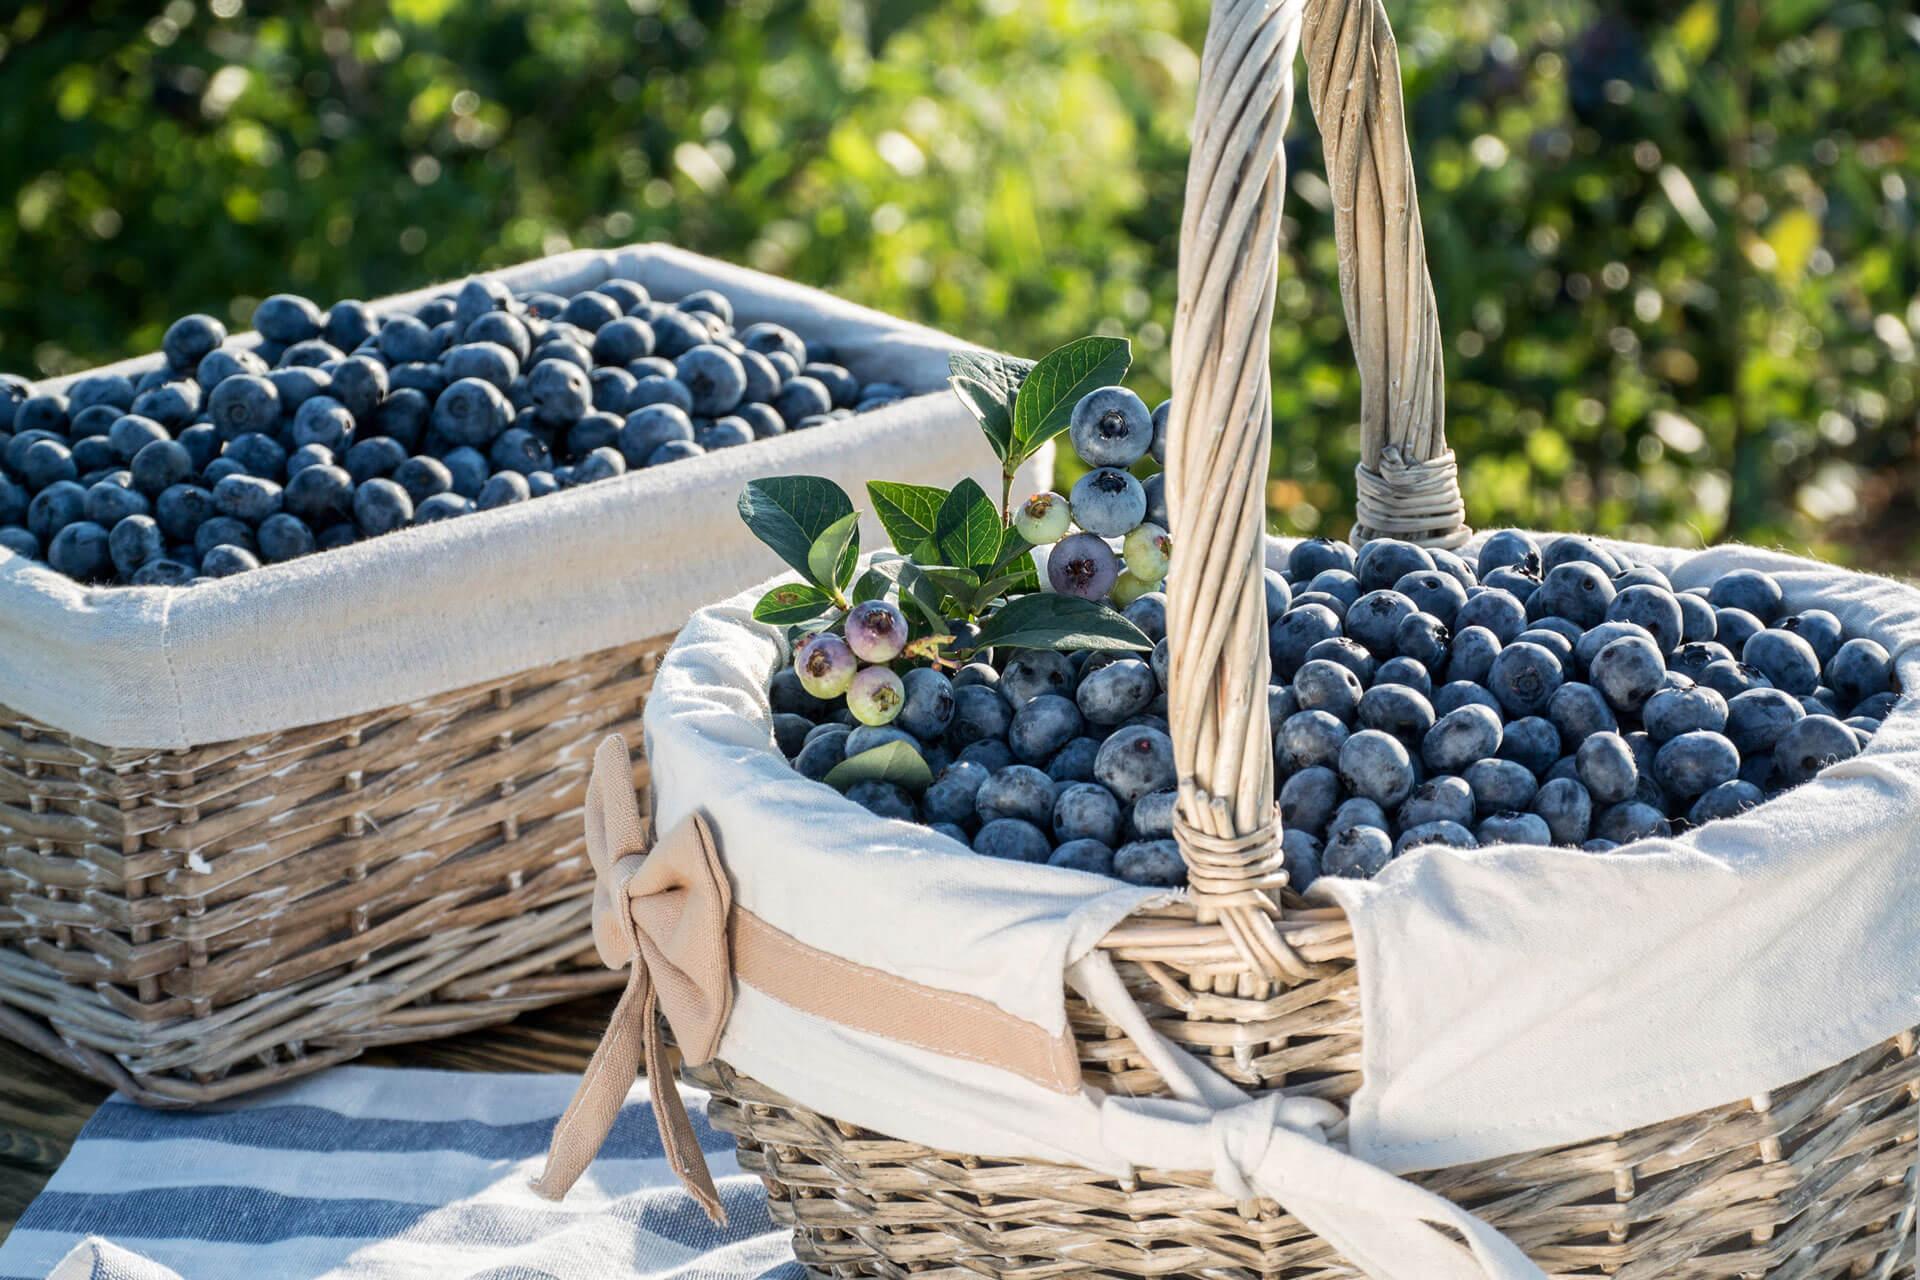 Ягоди лохини (чорниці садової) | Еко Карпати